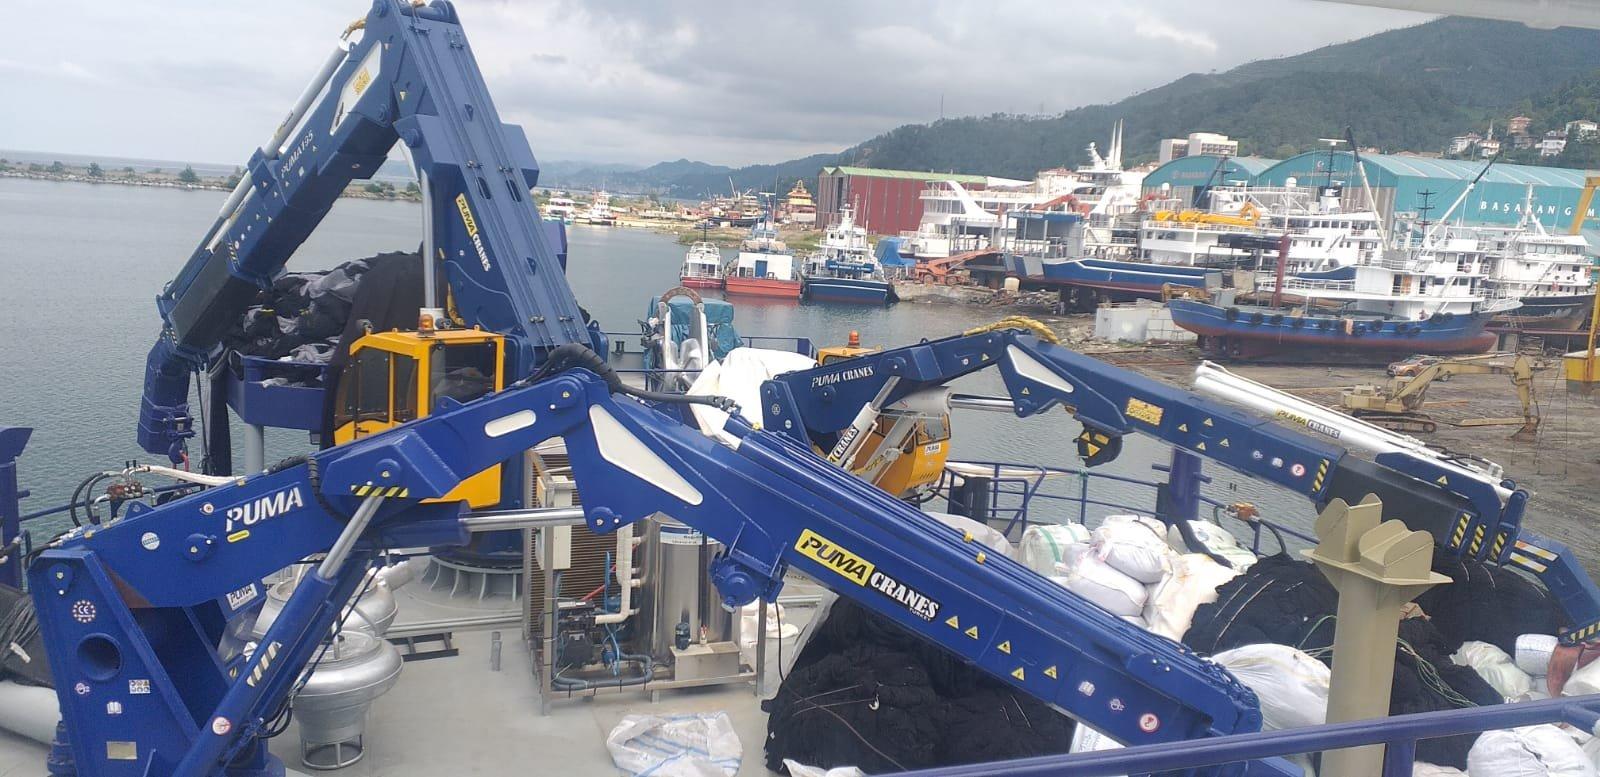 puma-marine-crane385557.jpg